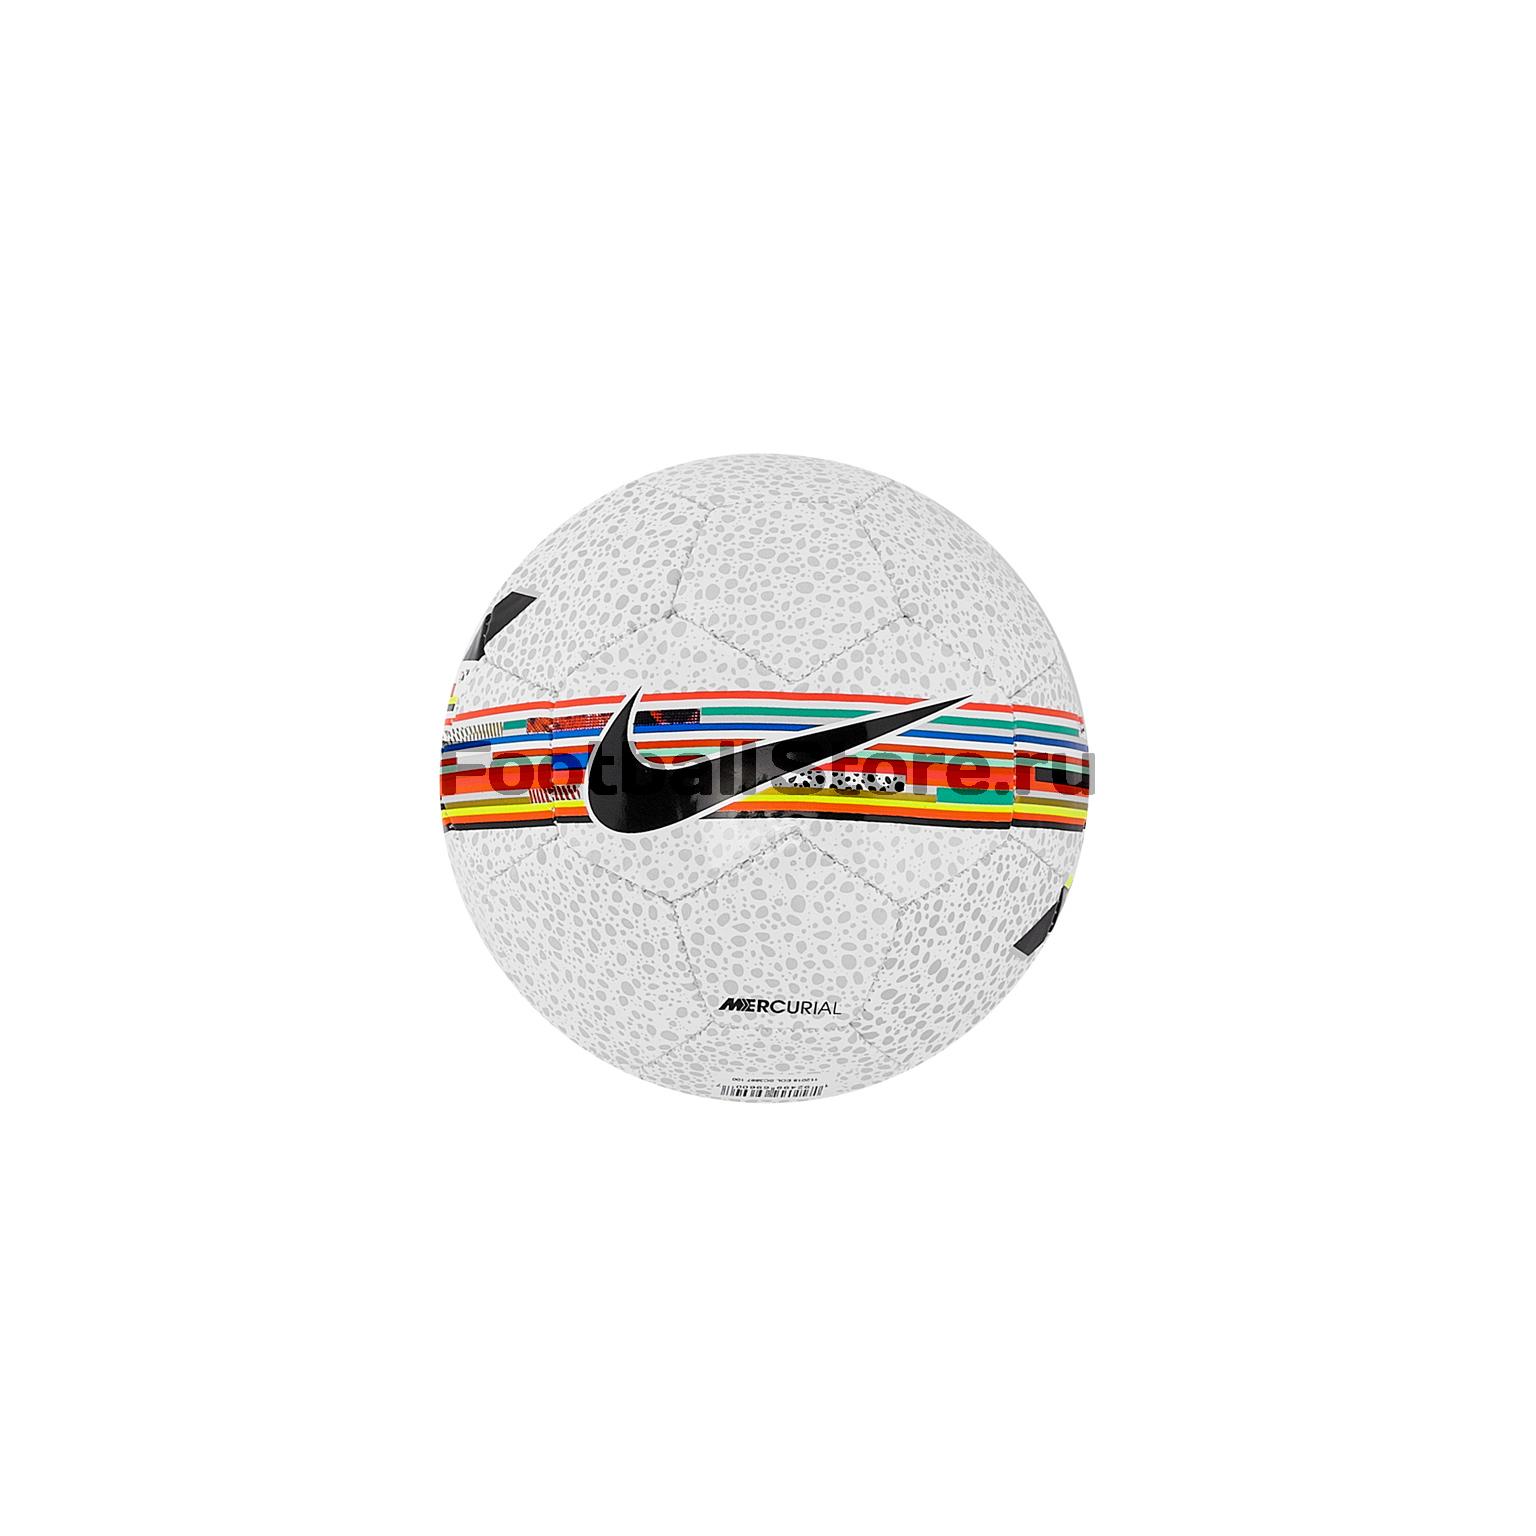 Мяч сувенирный Nike Mercurial Skills SC3897-100 цена